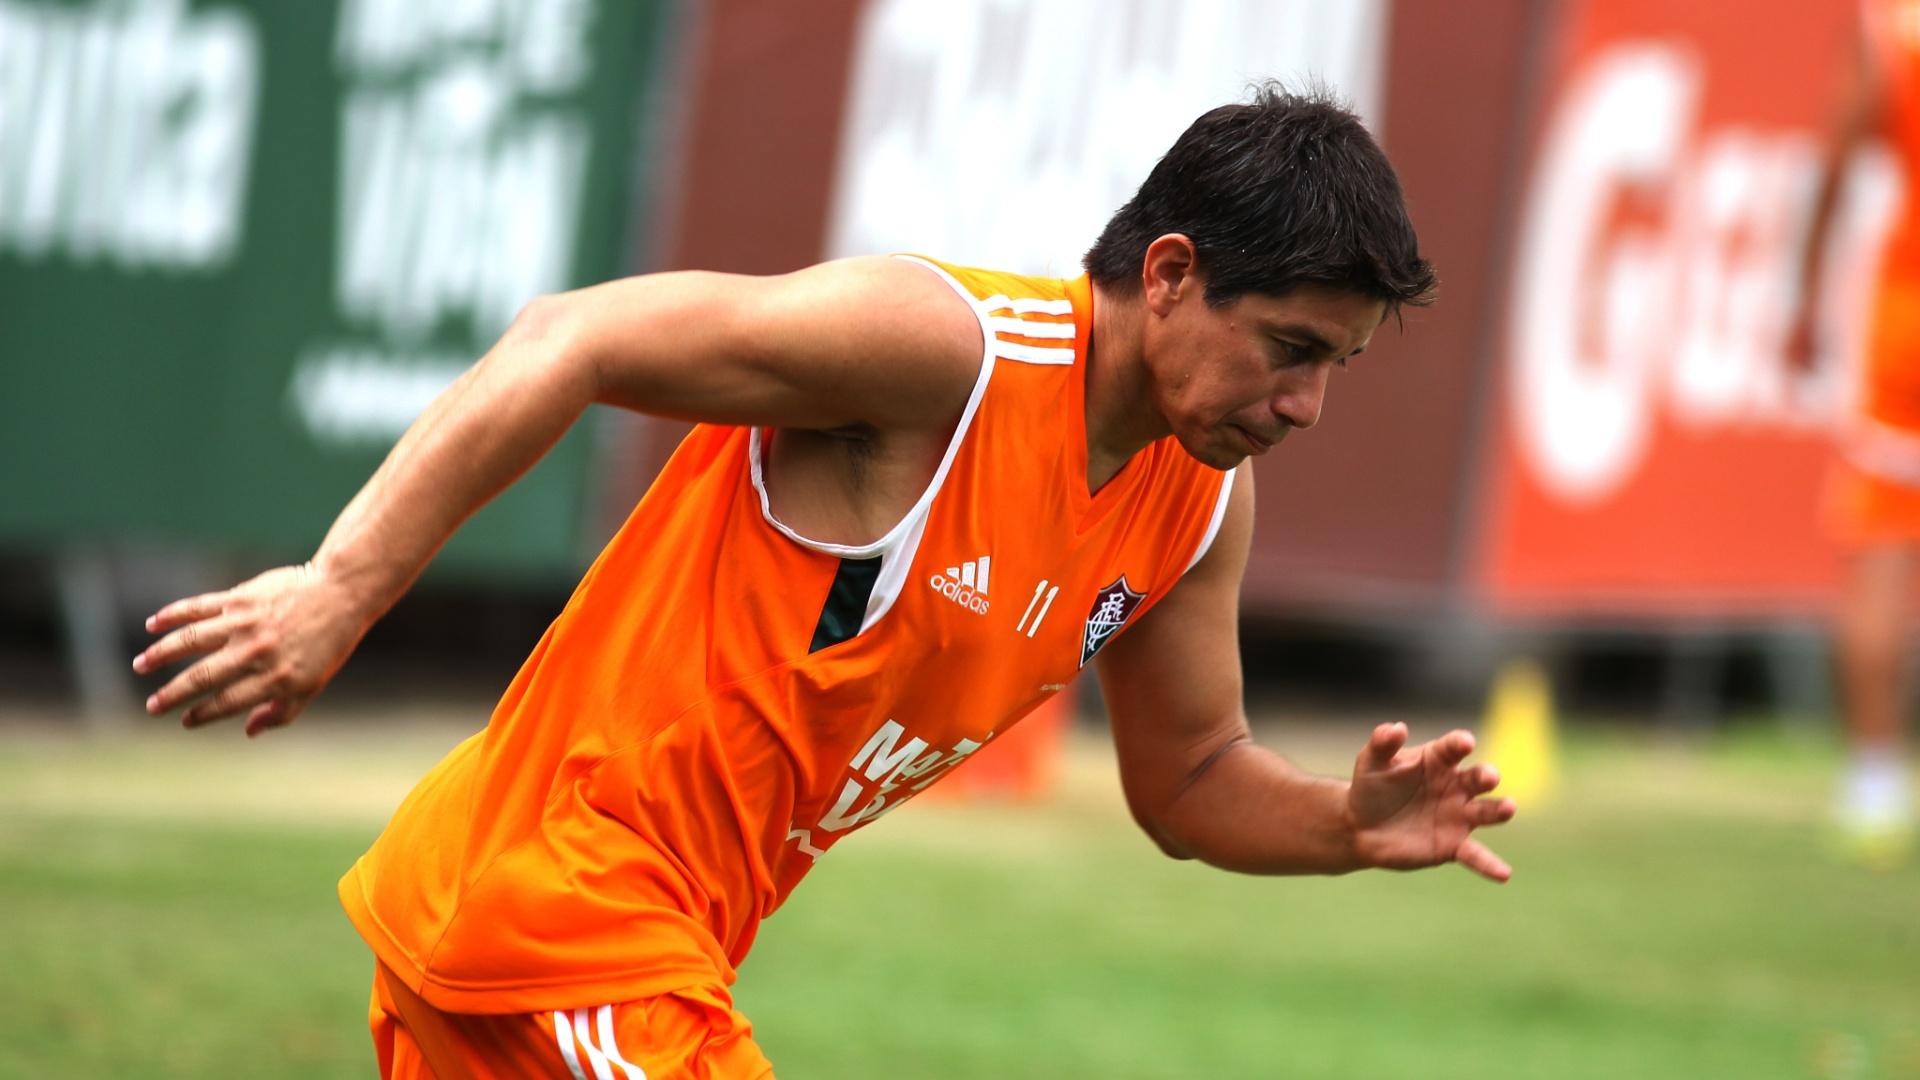 21 jan. 2015 - Argentino Conca participa da pré-temporada do Fluminense, realizada nas Laranjeiras